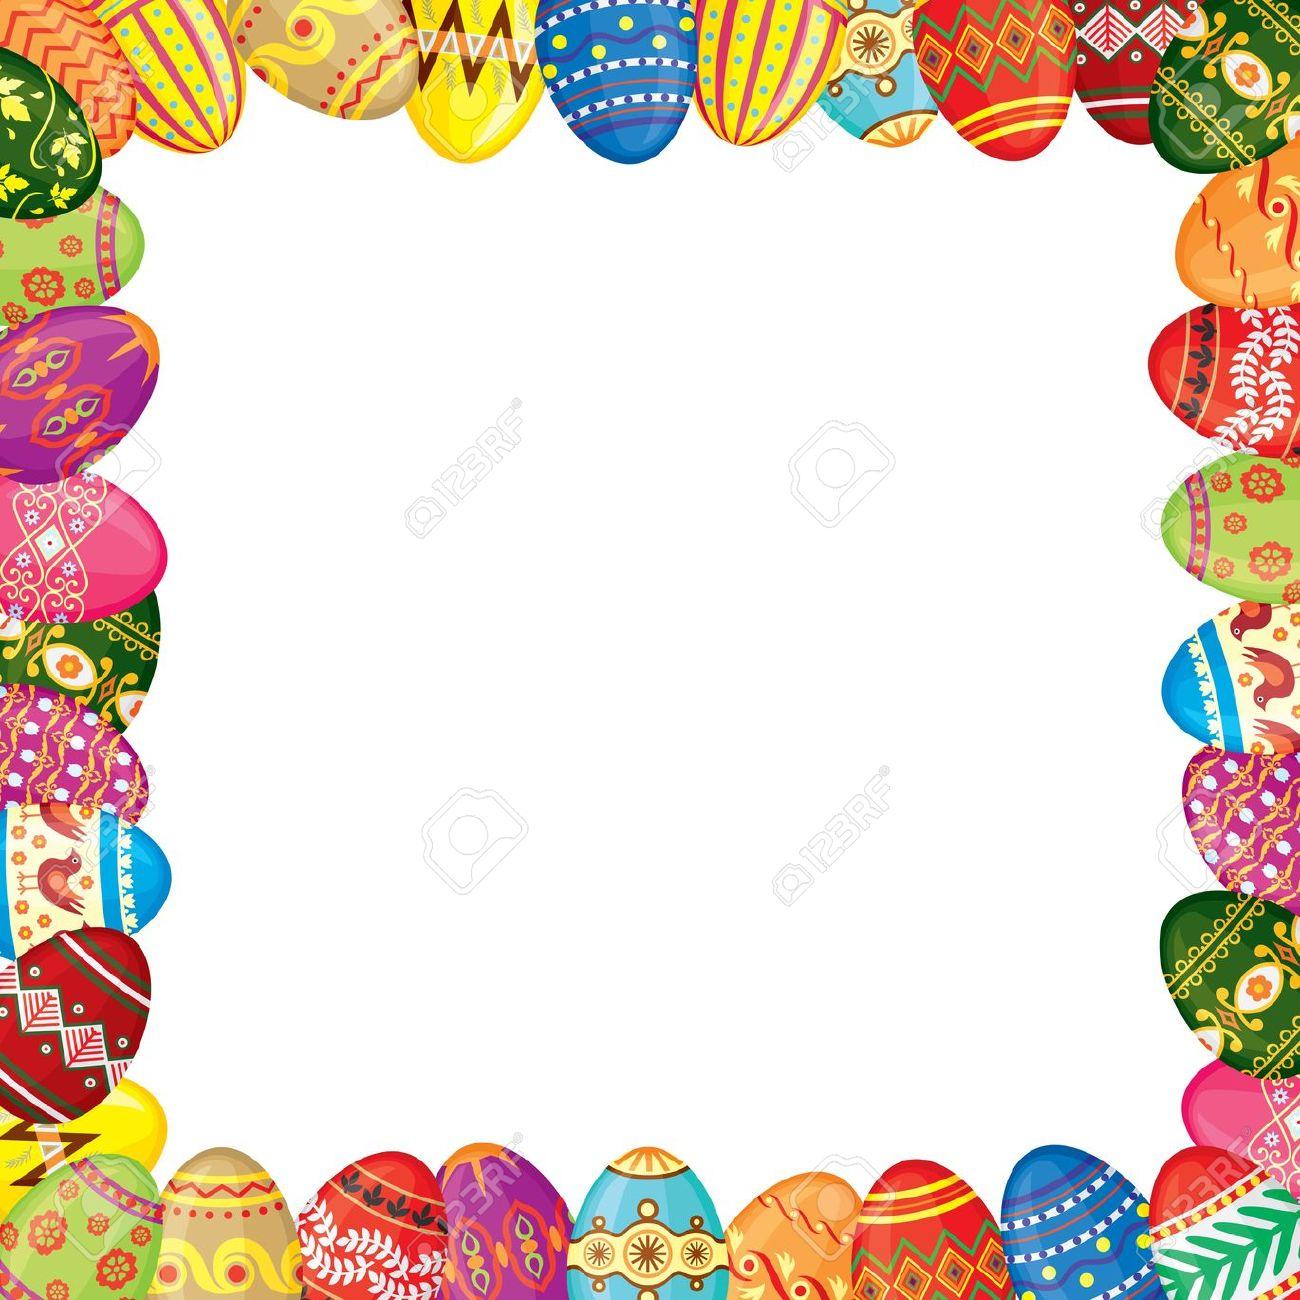 Easter egg border clip art picture freeuse stock Easter frame clip art - ClipartFest picture freeuse stock